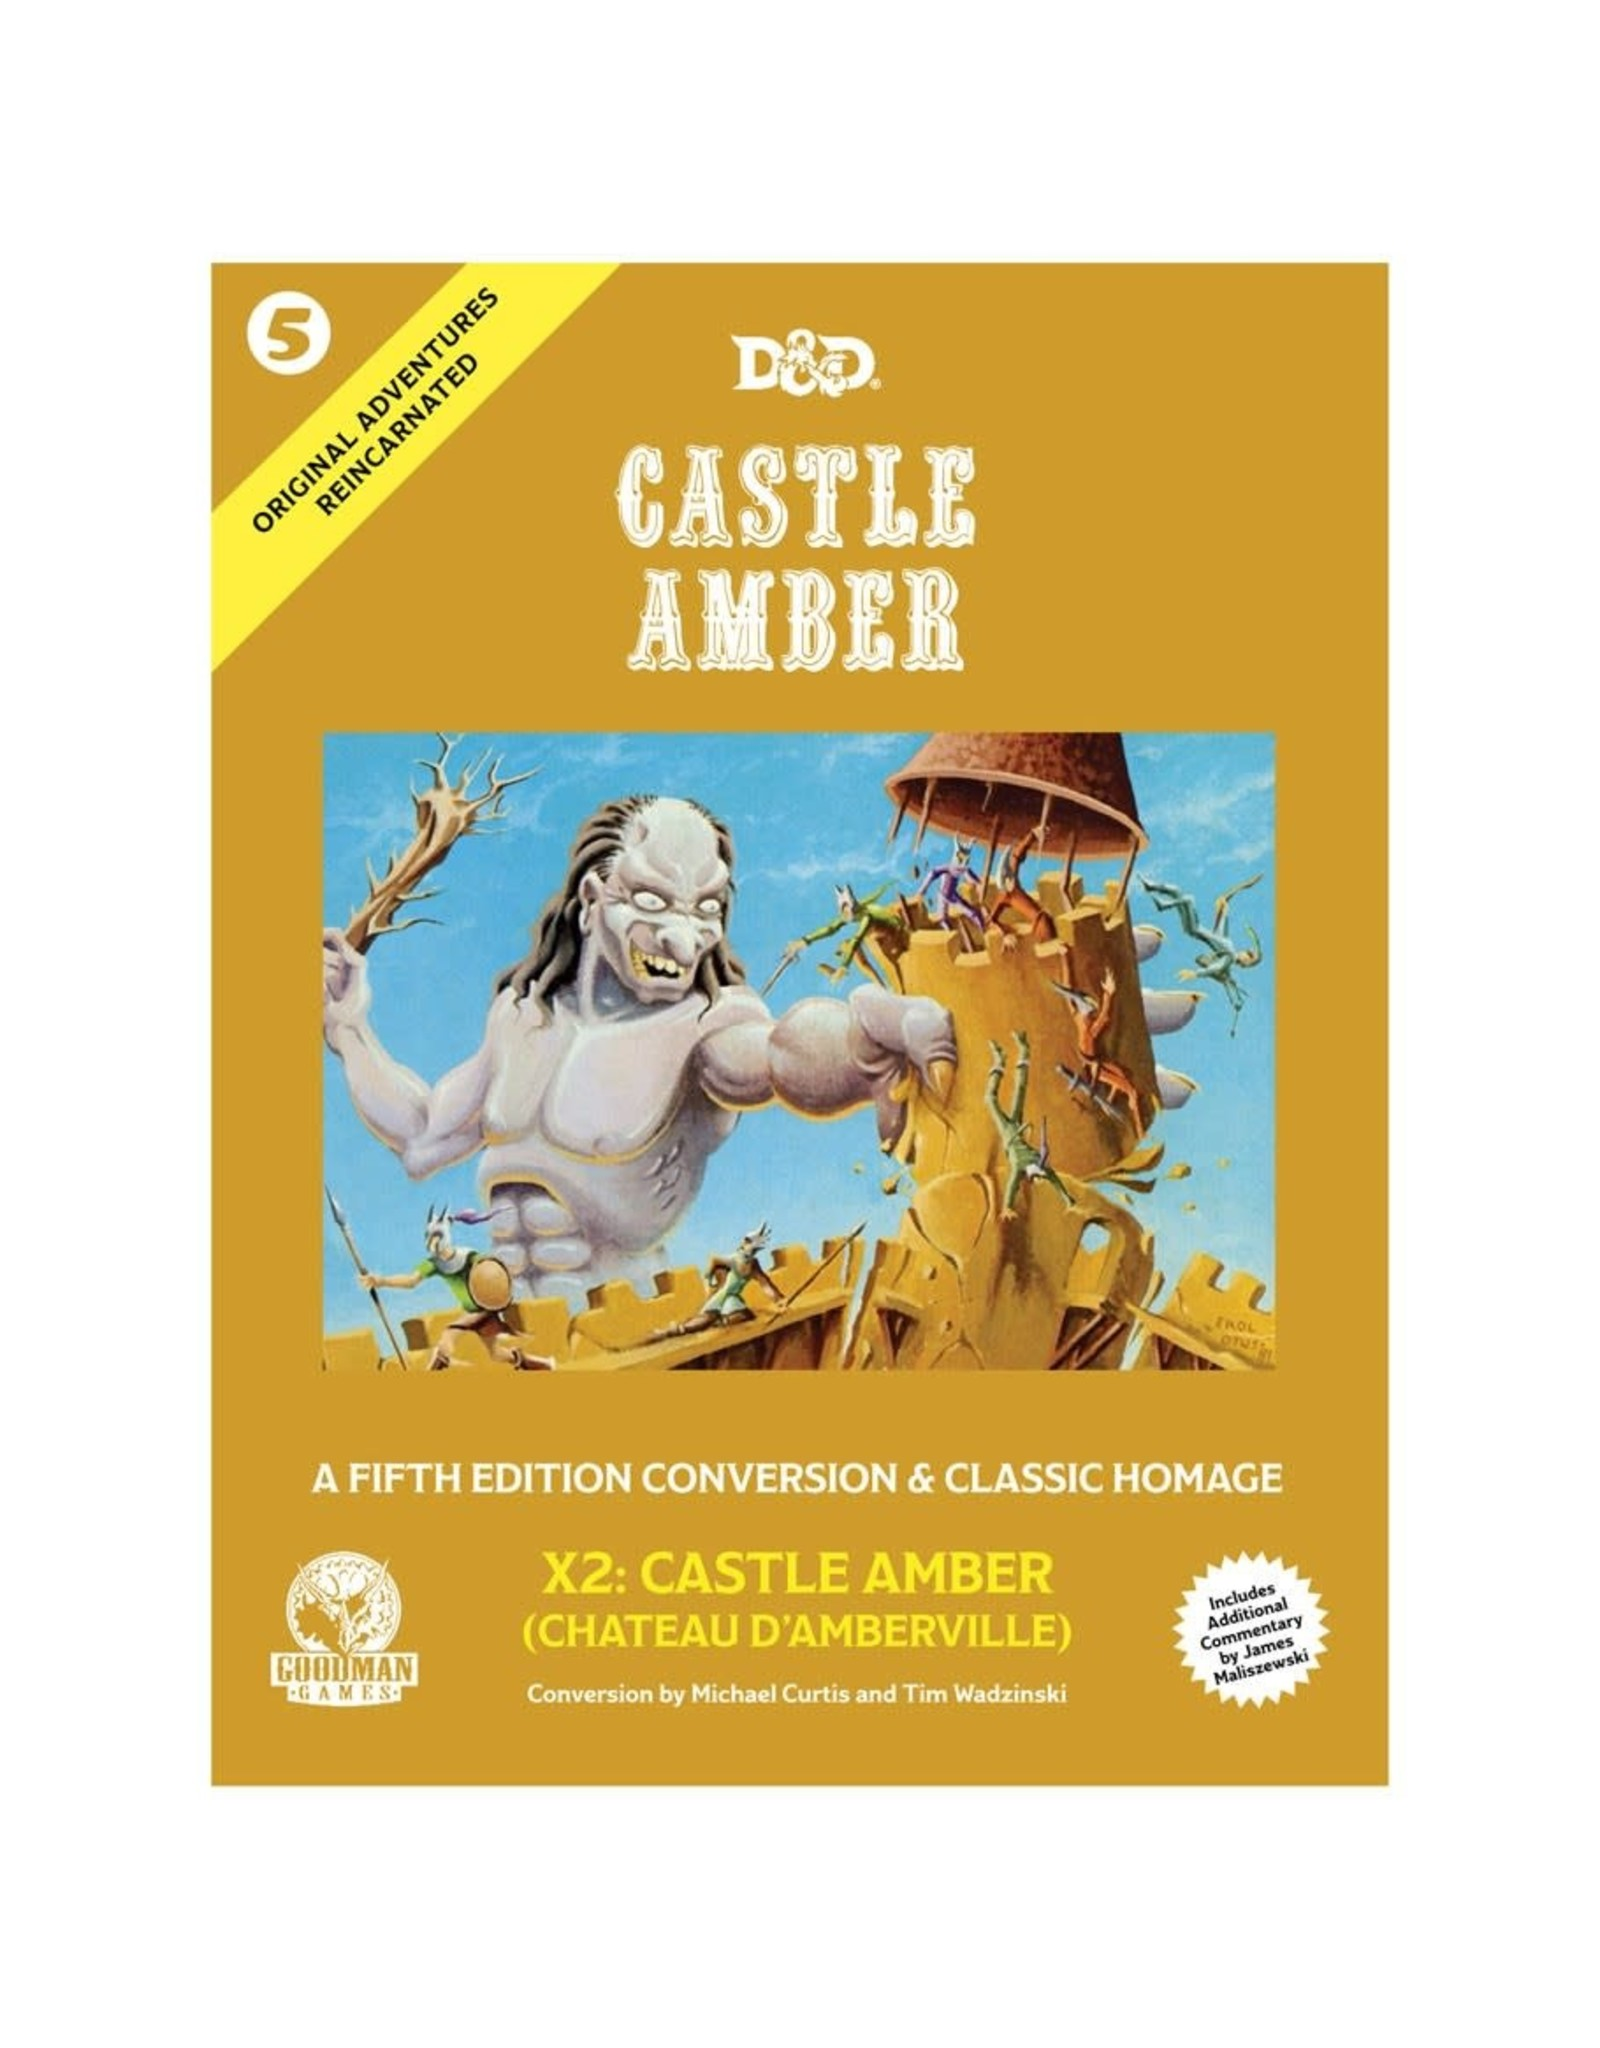 Goodman Games Dungeons & Dragons 5e: Original Adventures Reincarnated 5: Castle Amber